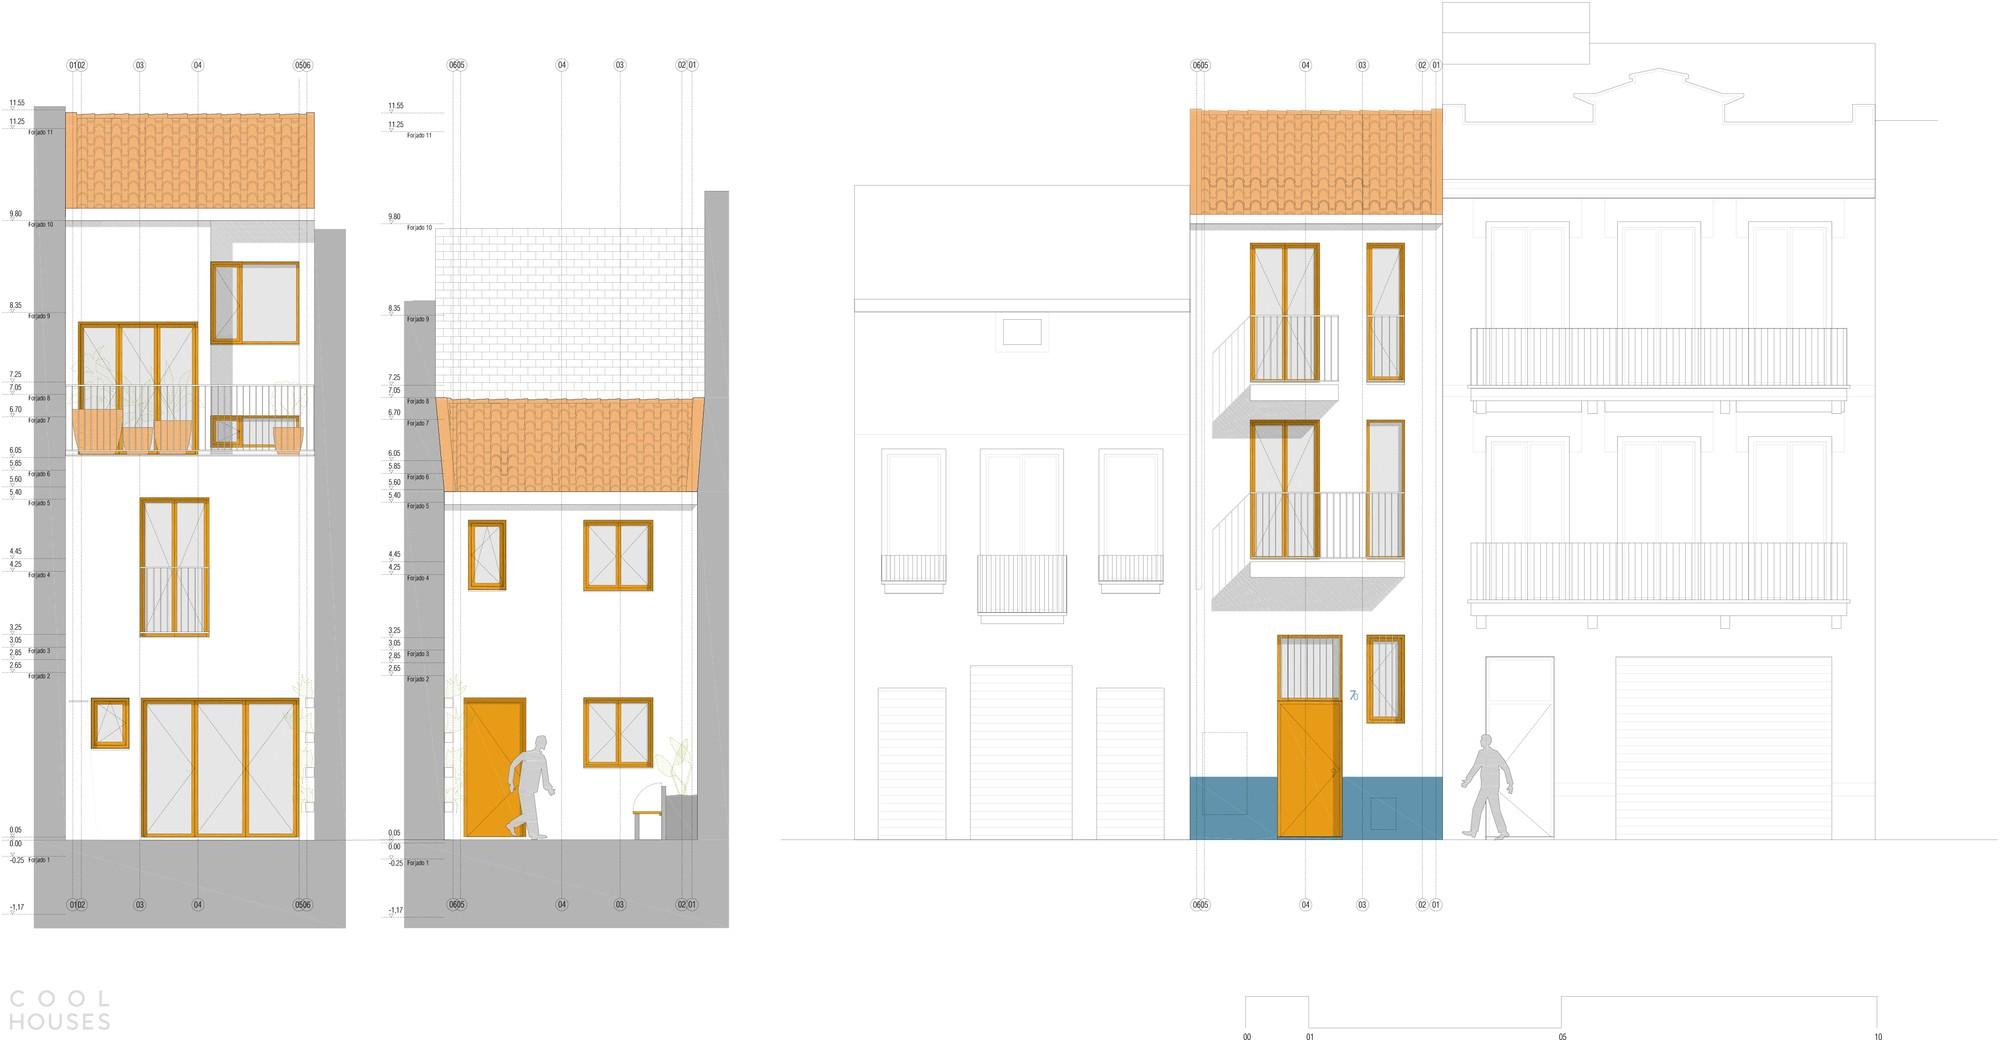 Таунхаус с узким фасадом, гармонирующим с архитектурой старого города